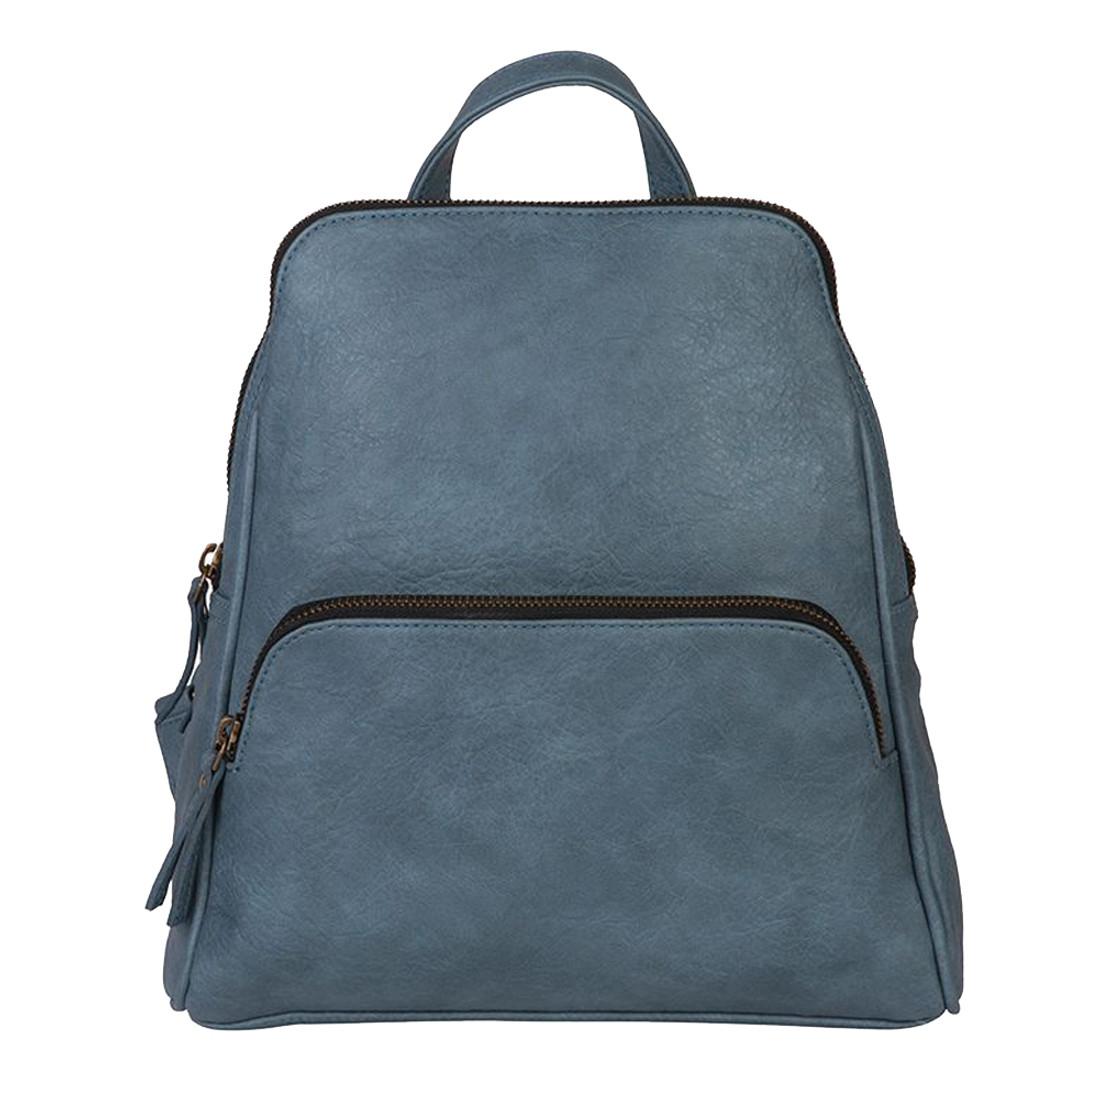 Mona B. Mini Convertible Backpack Purse